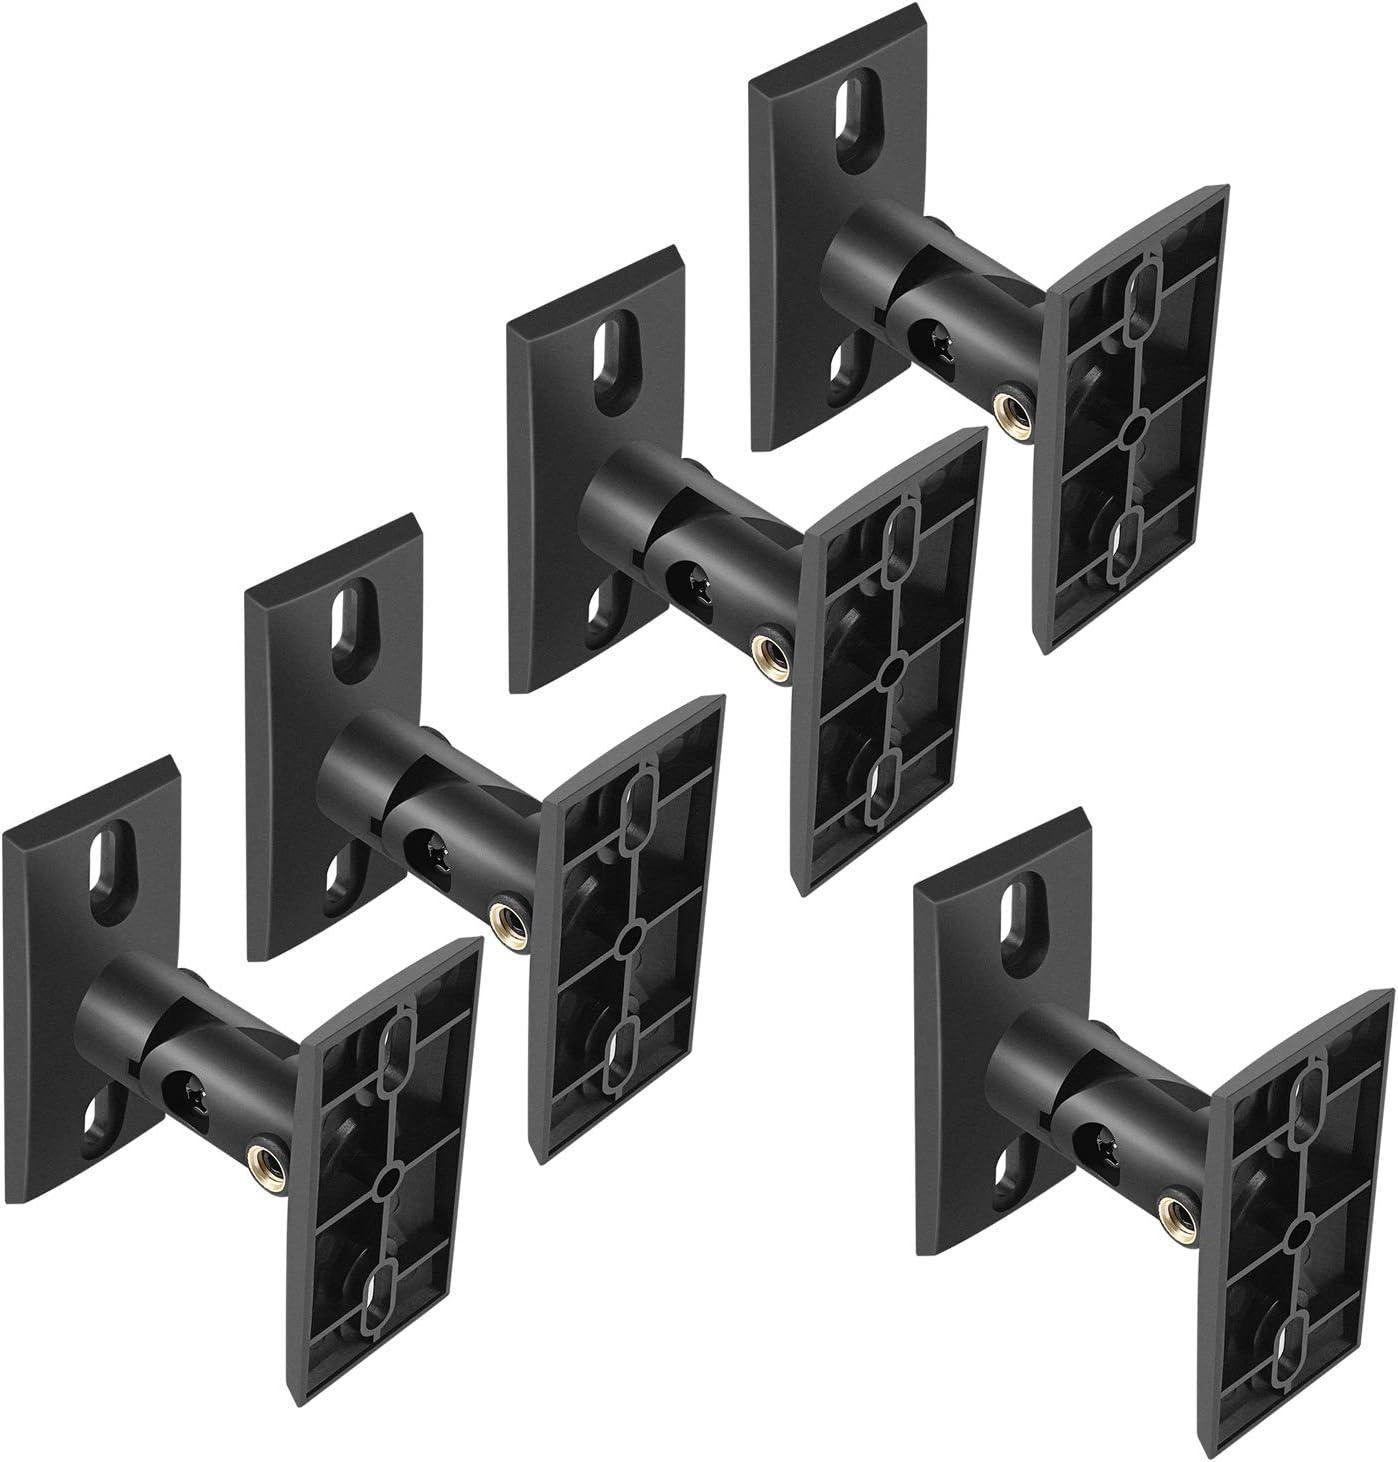 PERLESMITH Speaker Mounts - Universal Satellite Speaker Wall Brackets, 9  Pack - Adjustable Tilt and Swivel for Large Surround Sound Speakers - for